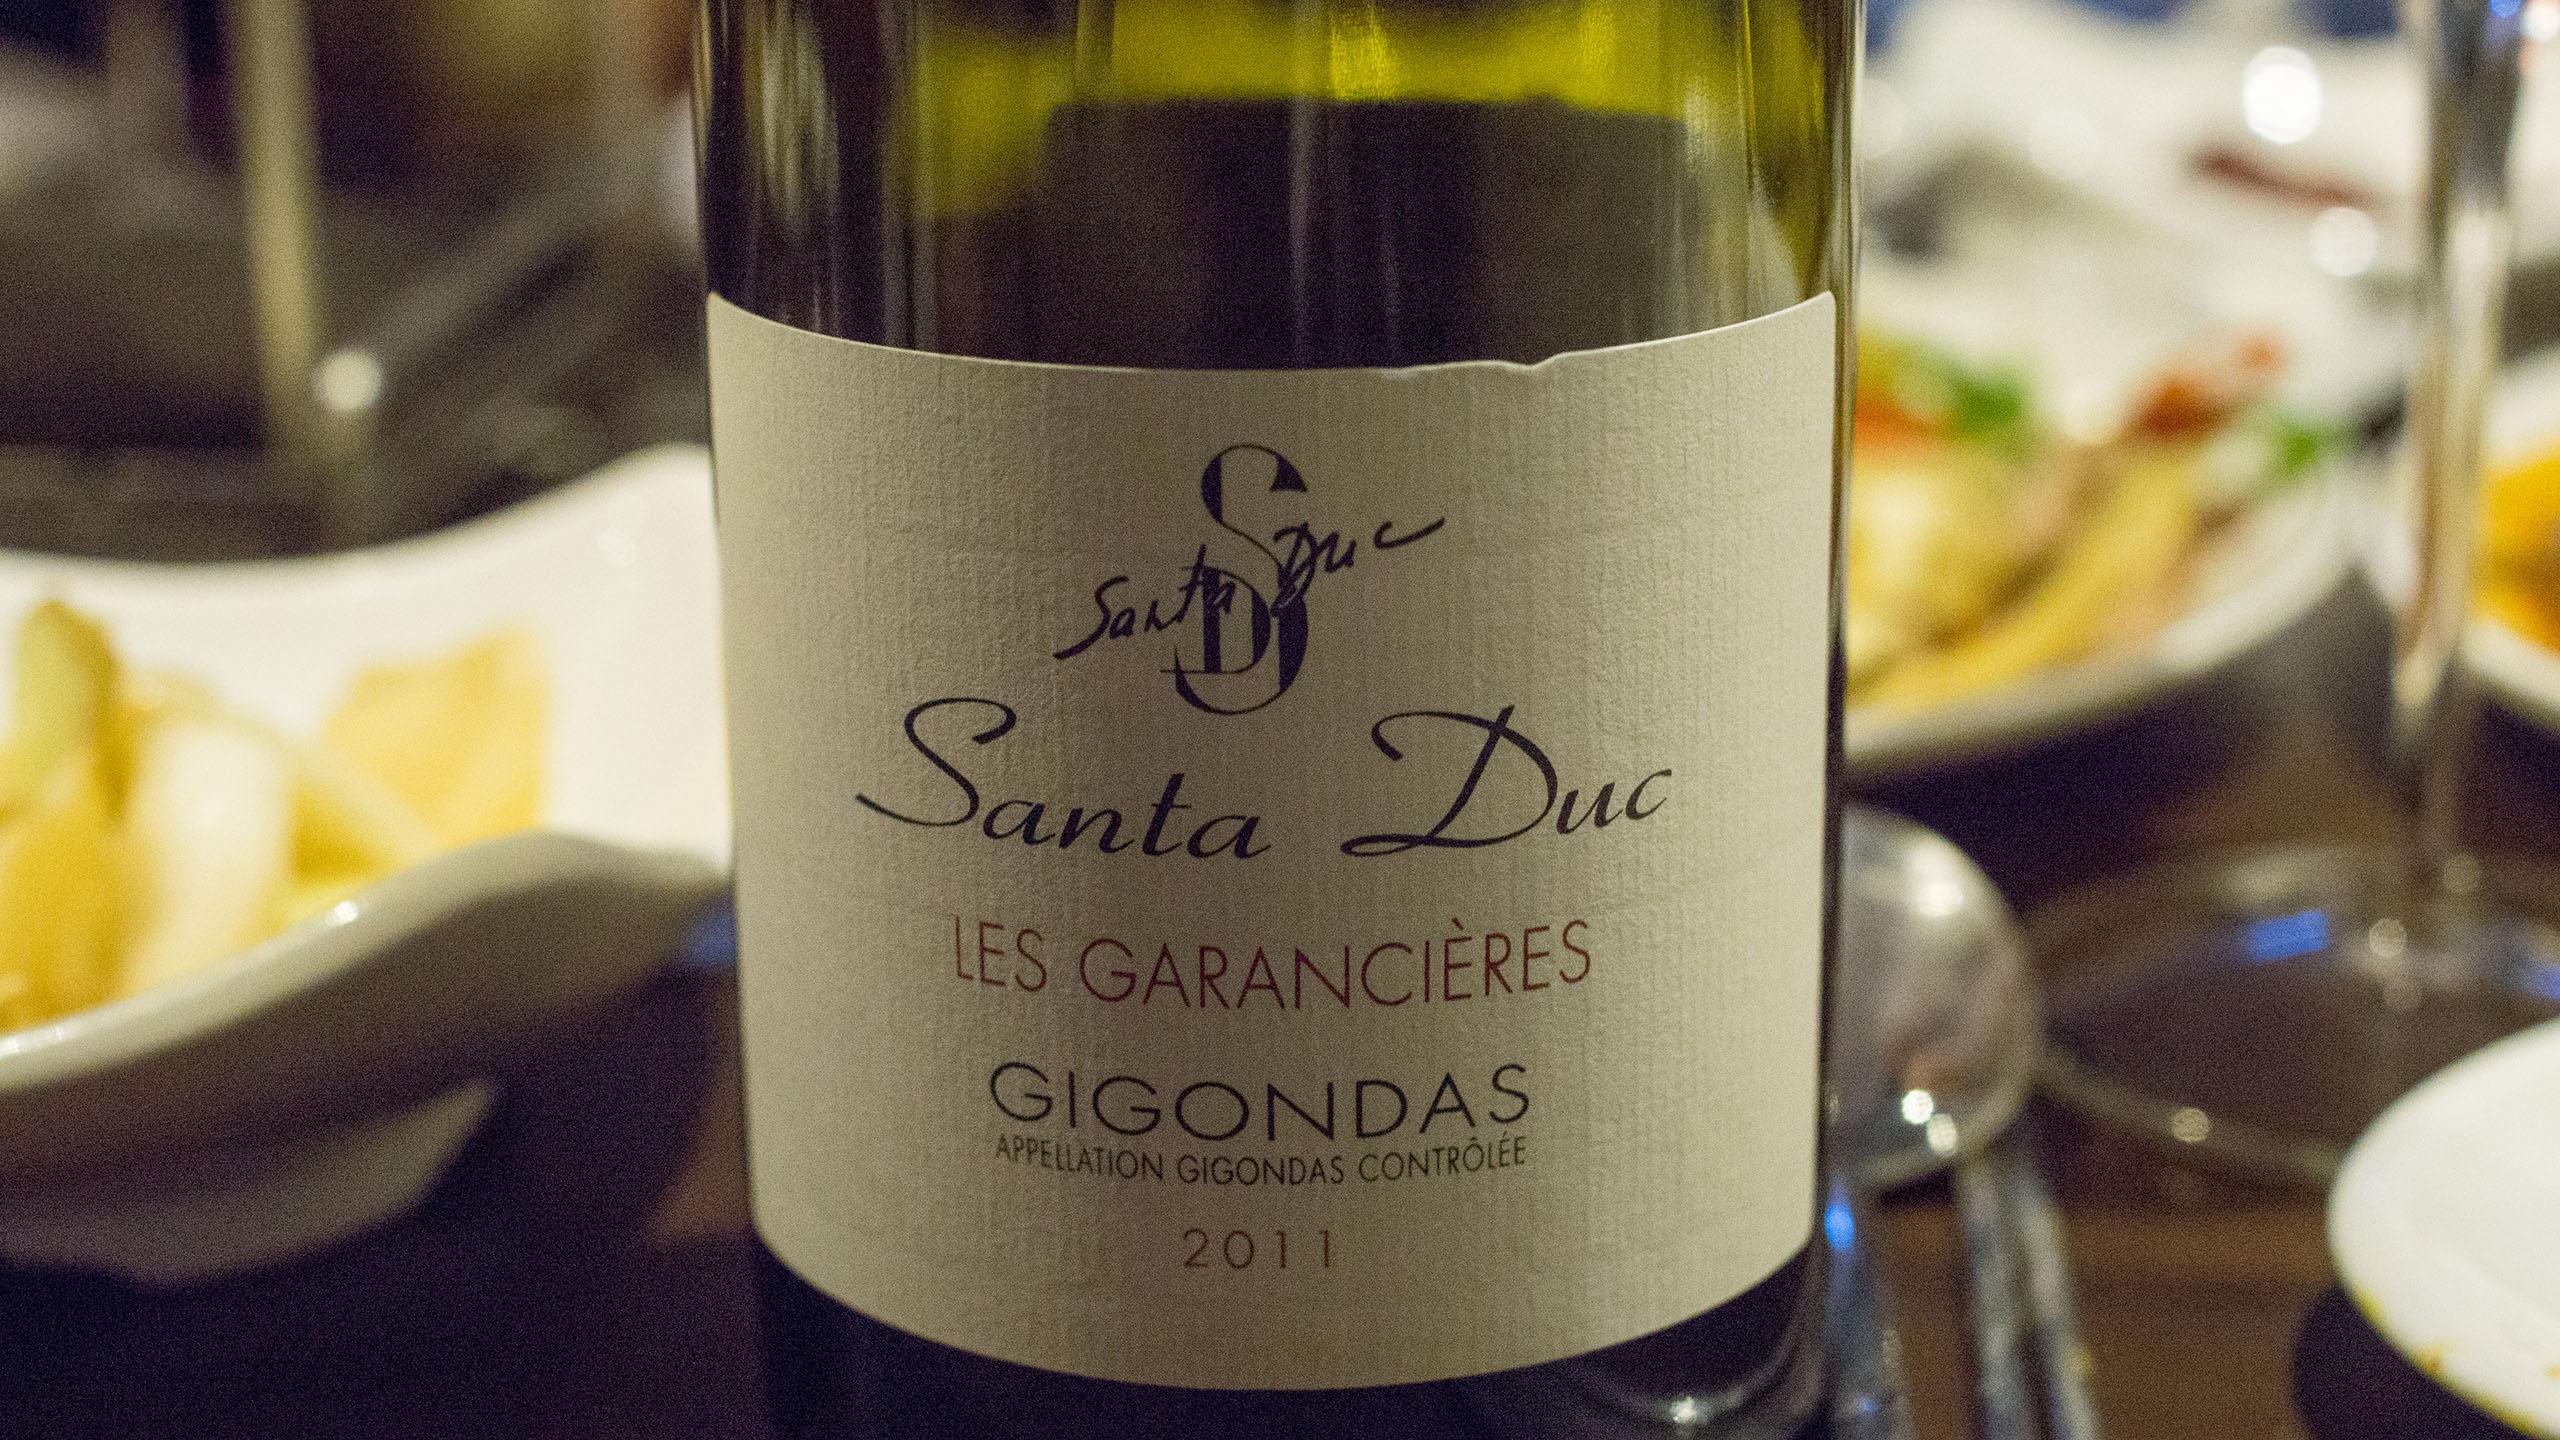 Domaine Santa Duc Gigondas 2012